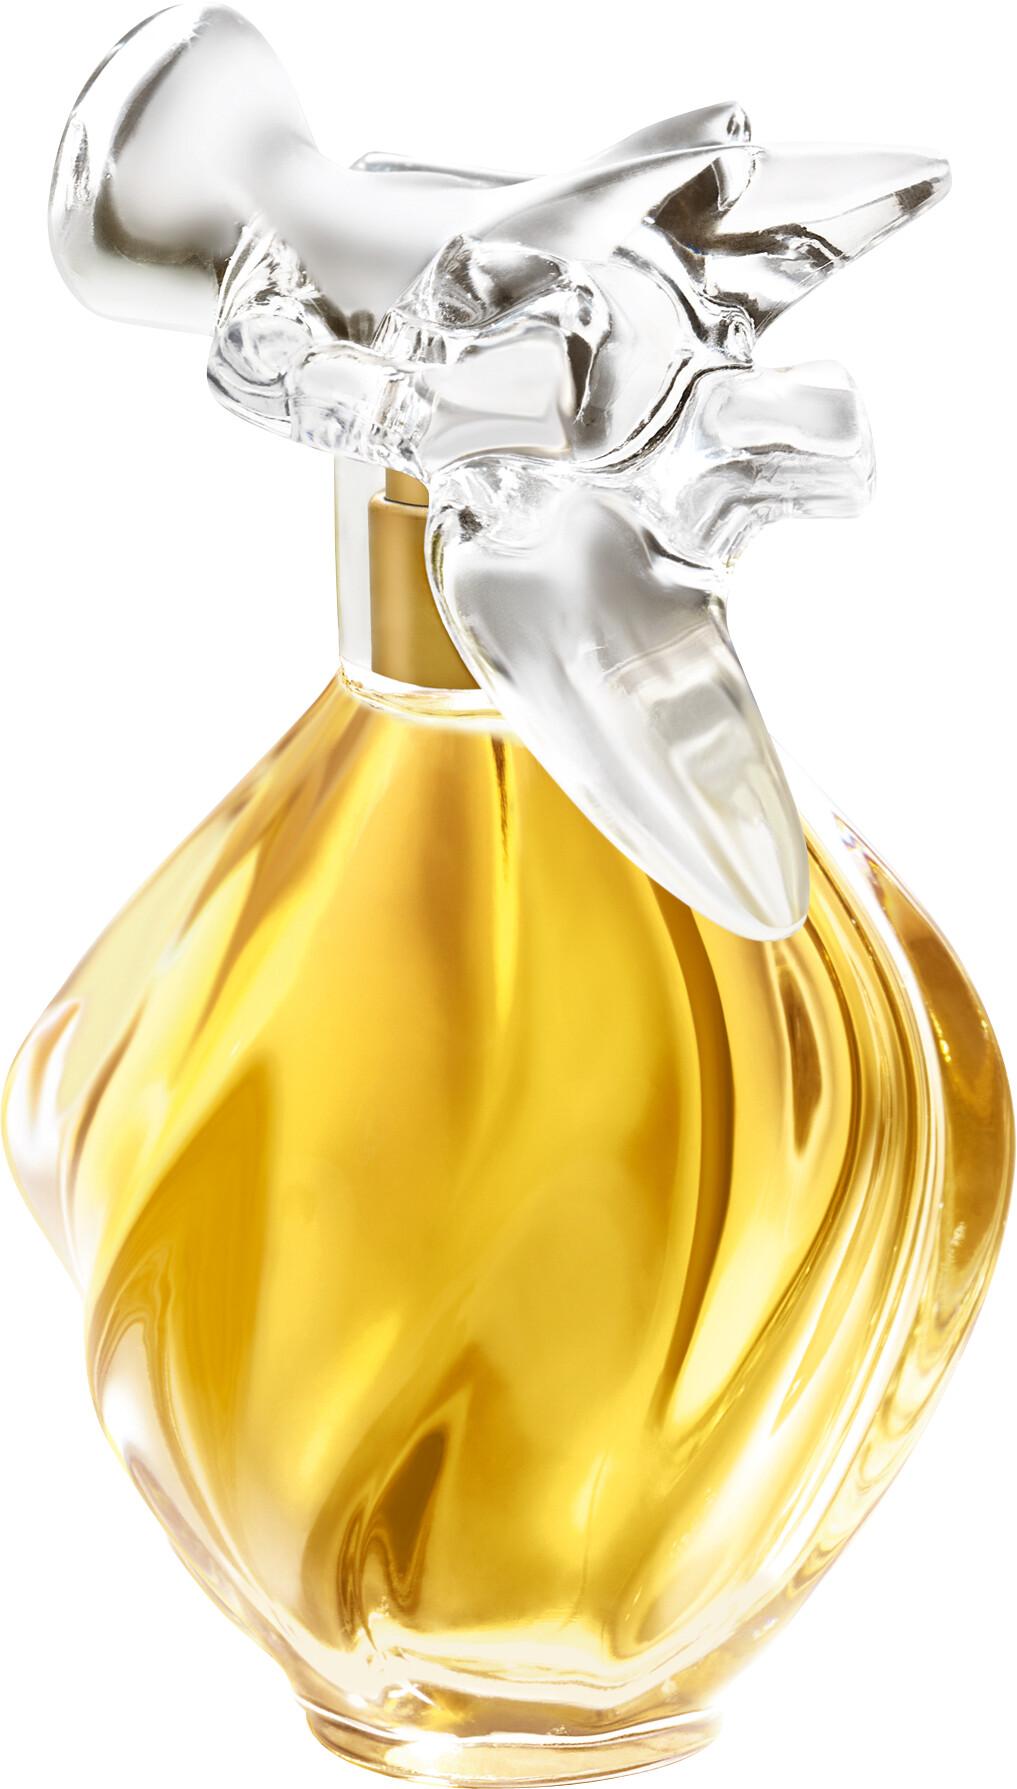 686baf9f89 ... Nina Ricci L Air du Temps Eau de Parfum Spray 100ml